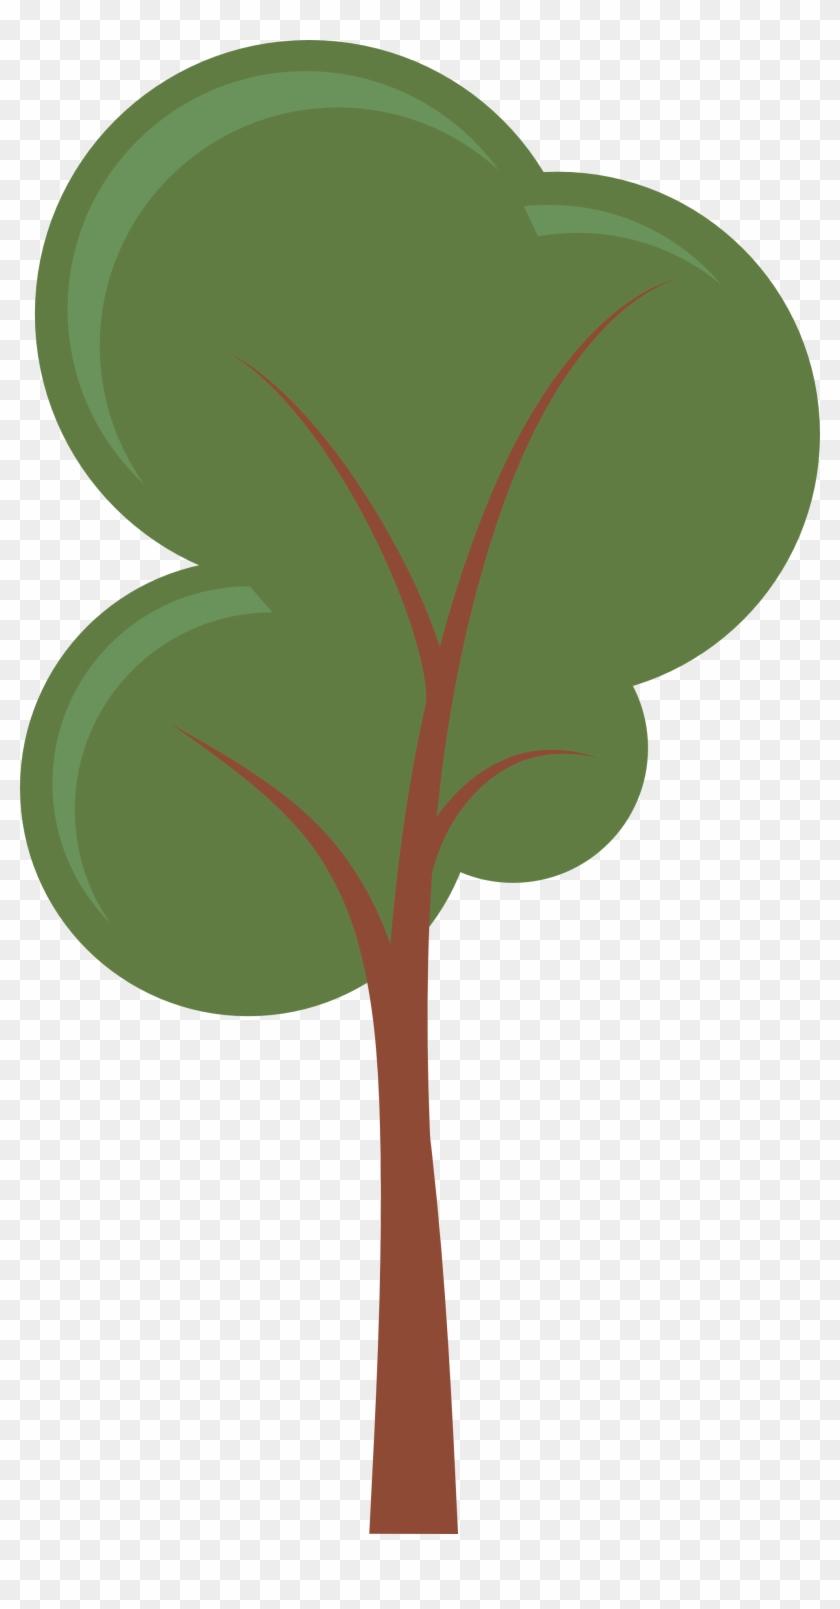 Transparent Tree Cliparts - Cartoon Trees #30172